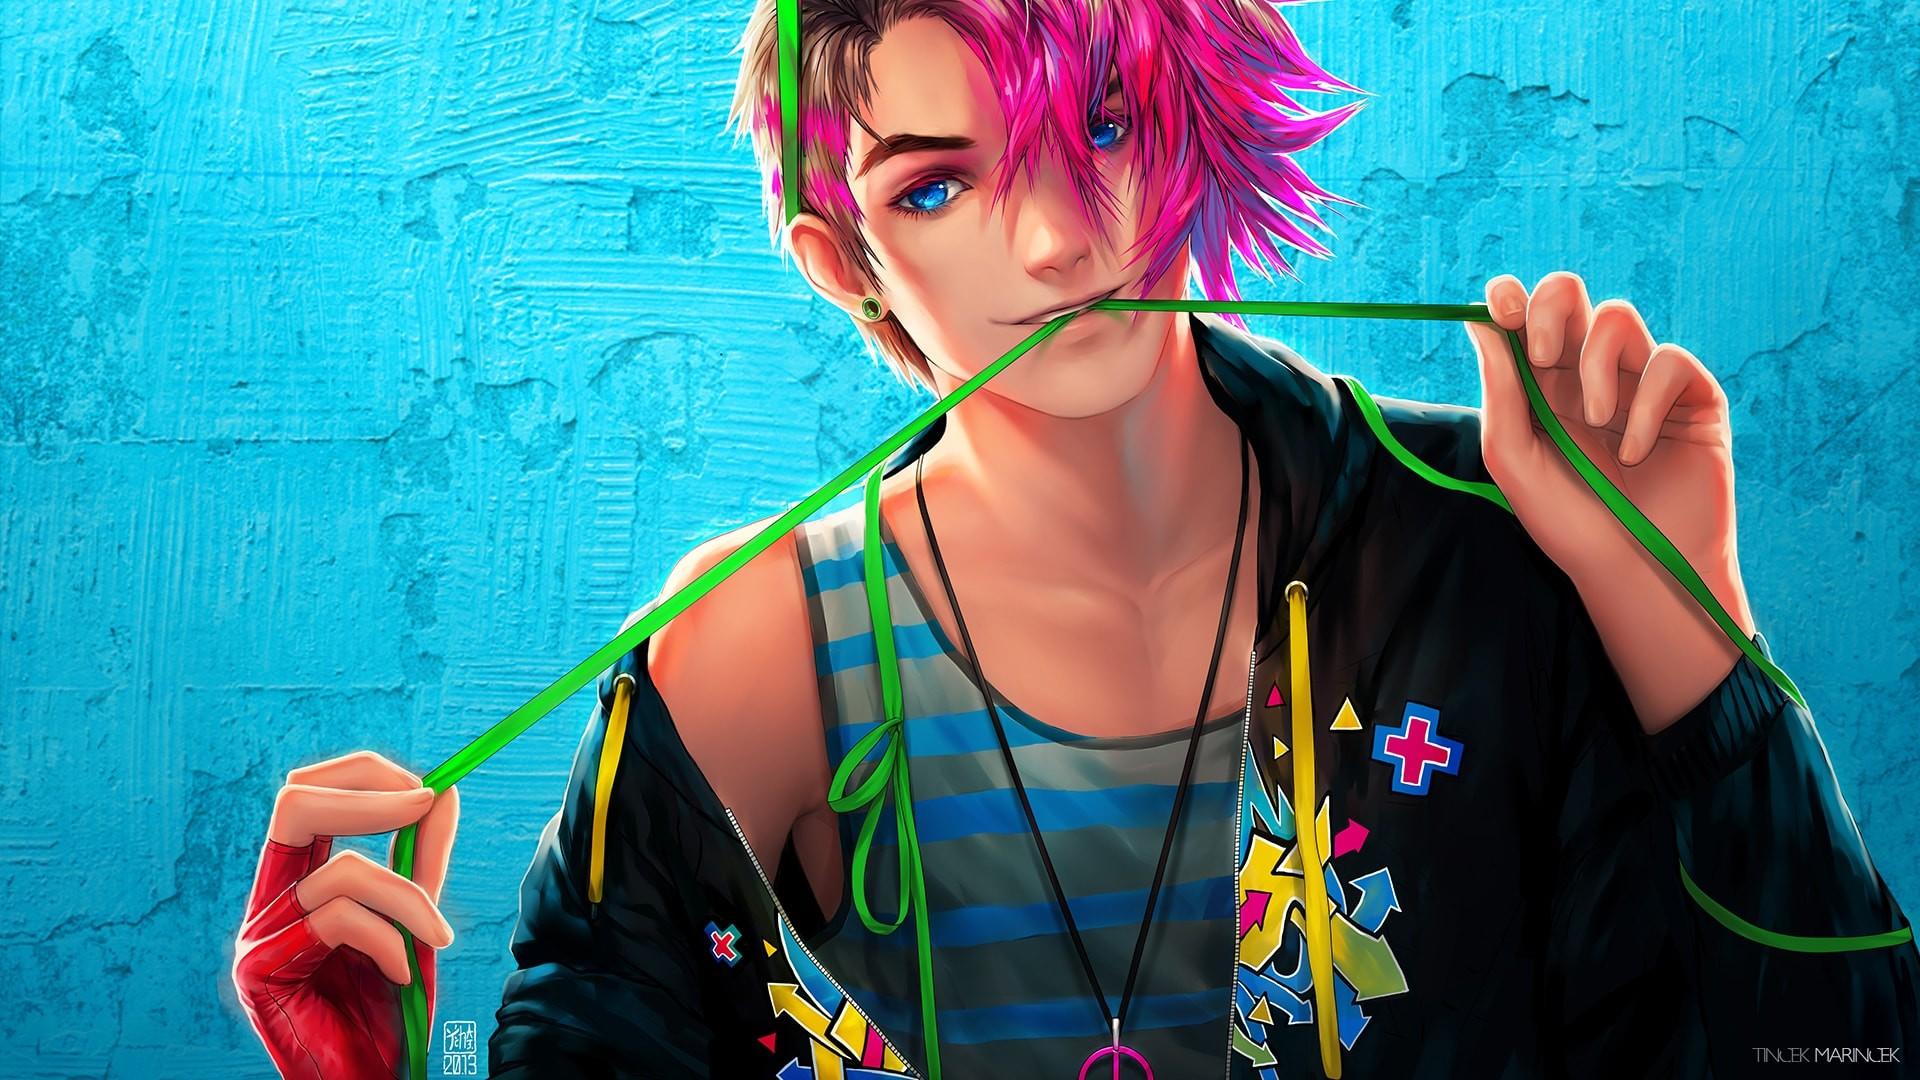 Stylish Anime Boy. Stylish Anime Boy hd wallpaper